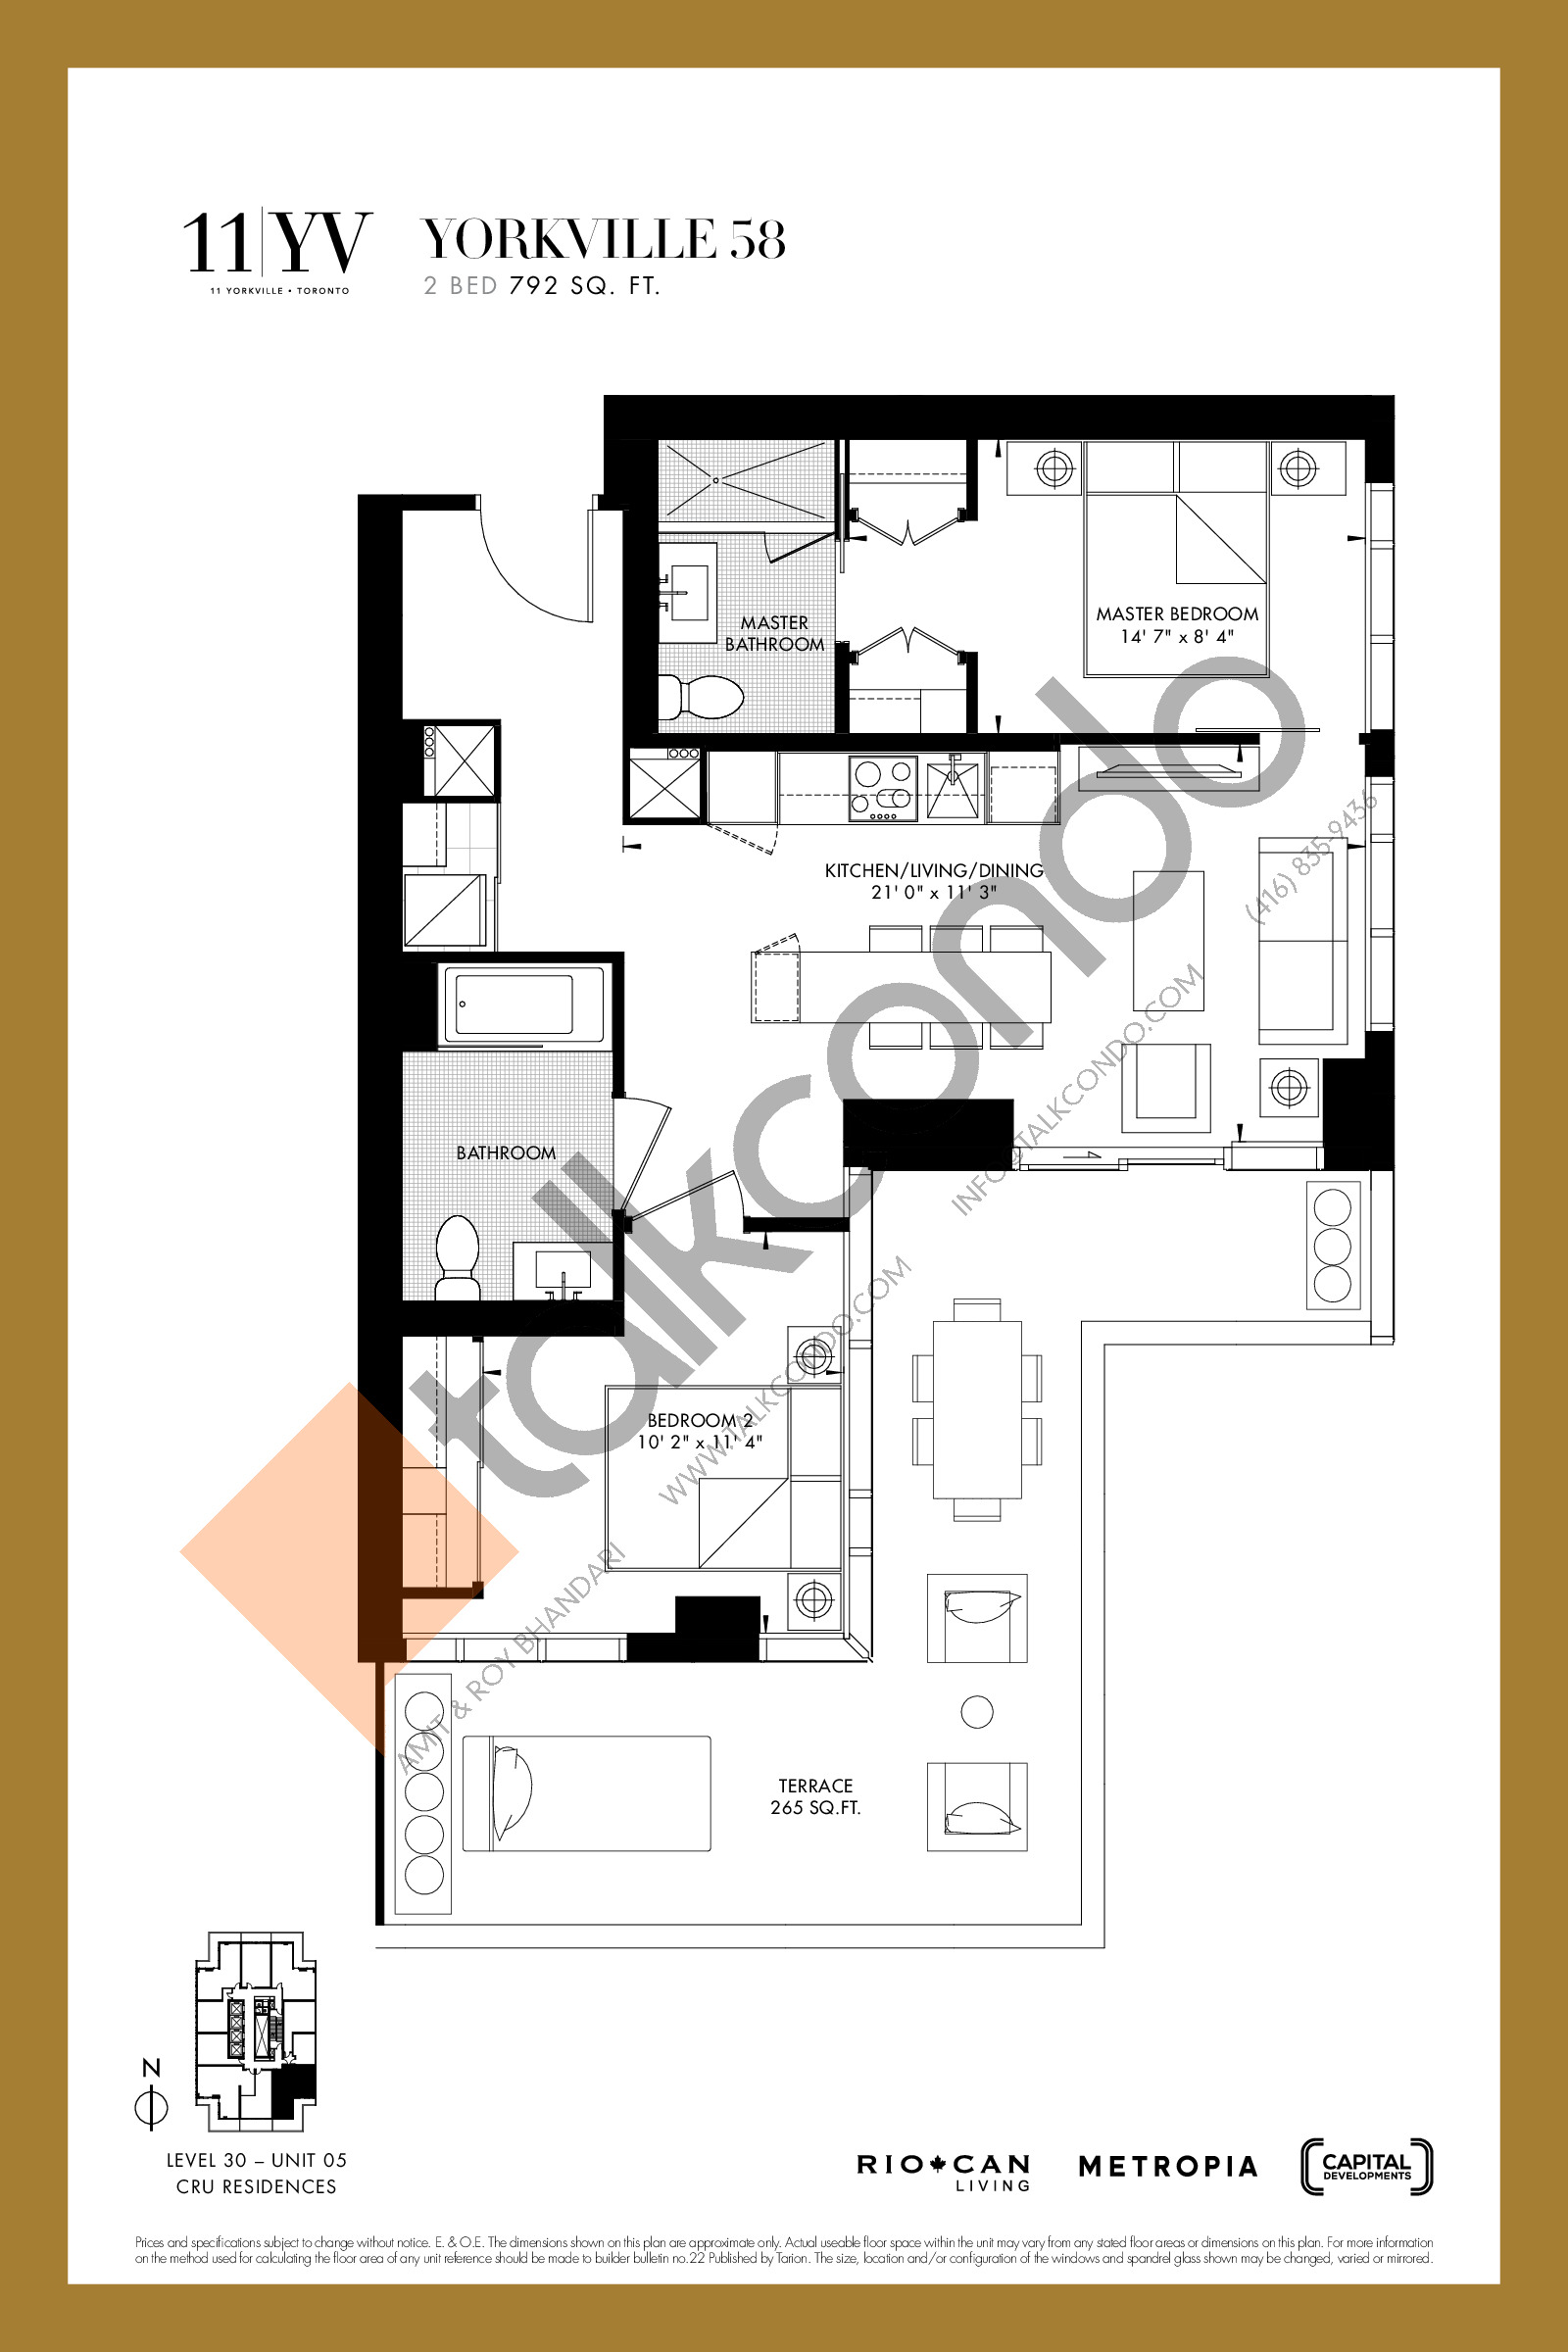 Yorkville 58 Floor Plan at 11YV Condos - 792 sq.ft